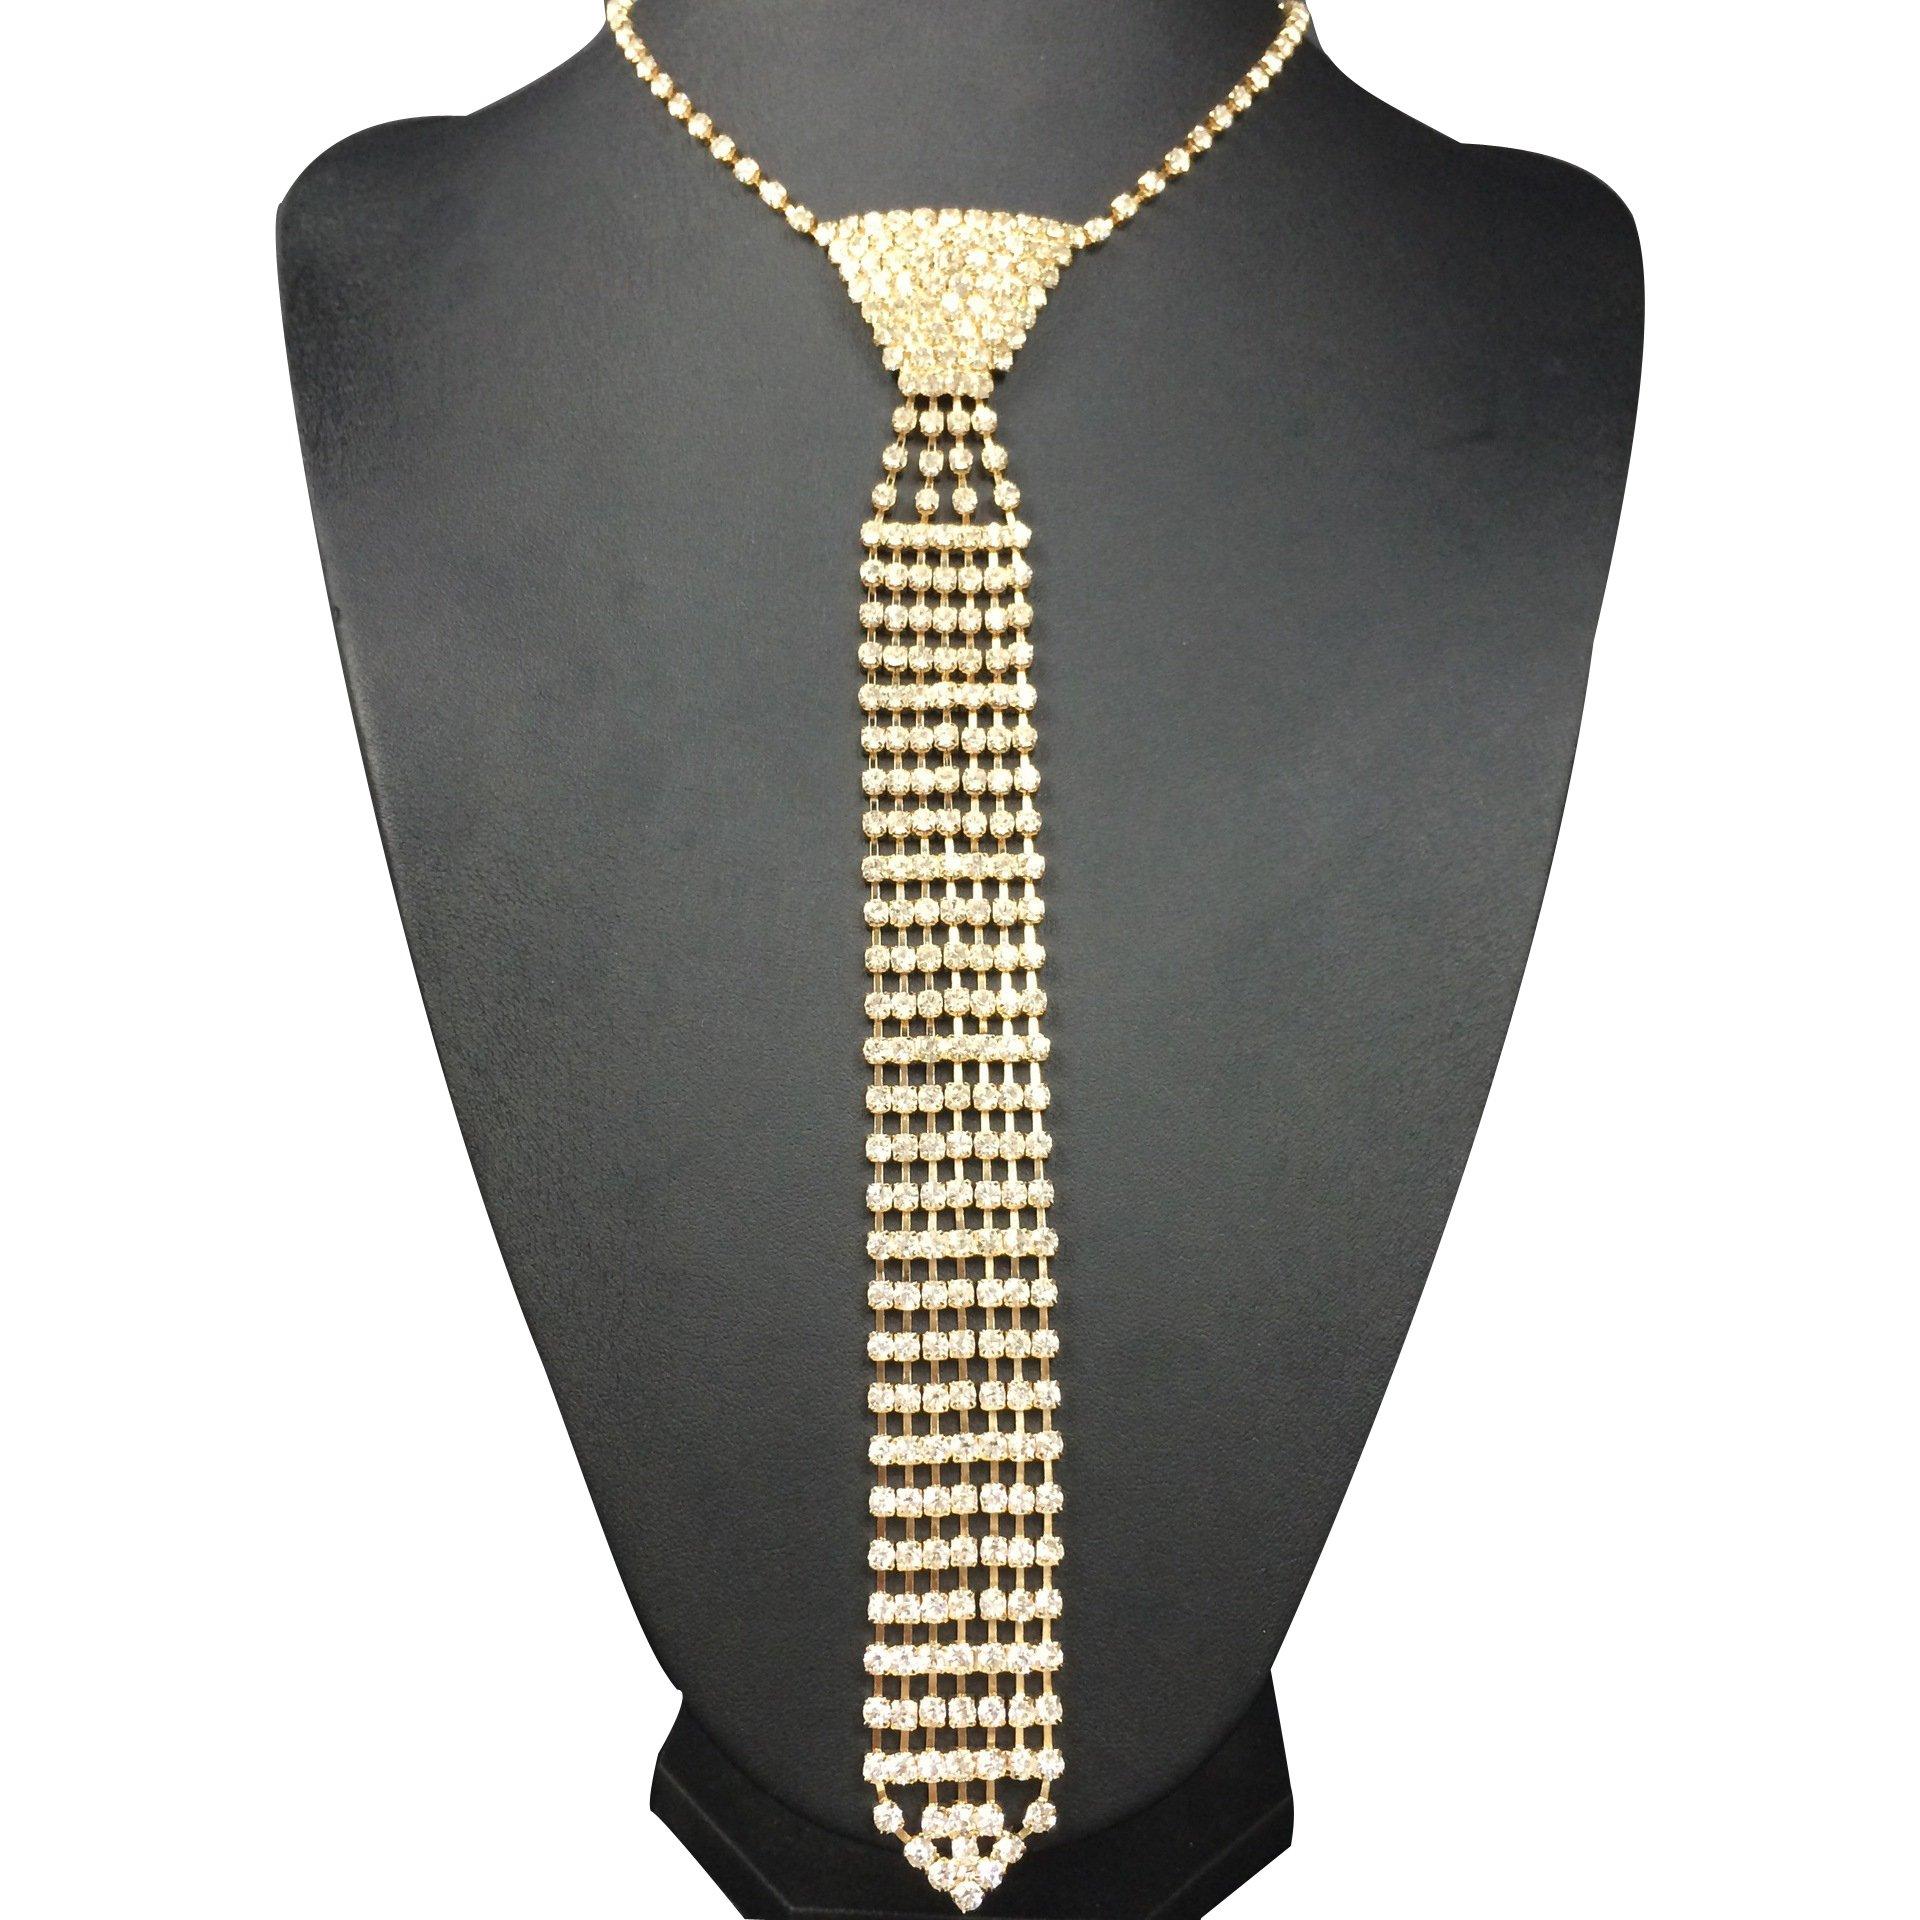 Fashion Sexy Rhinestone Bow Tie Necktie Shape Necklace Shiny Collar Choker Wedding Necklace (Gold Long Style)